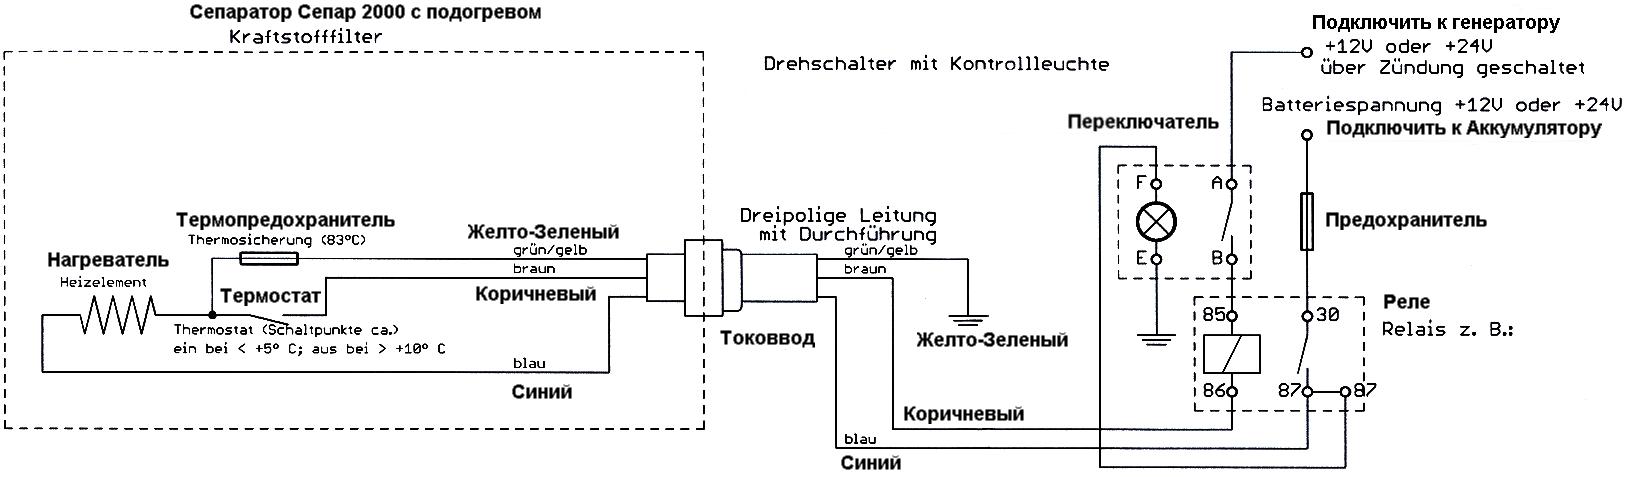 Электросхема Сепар 2000